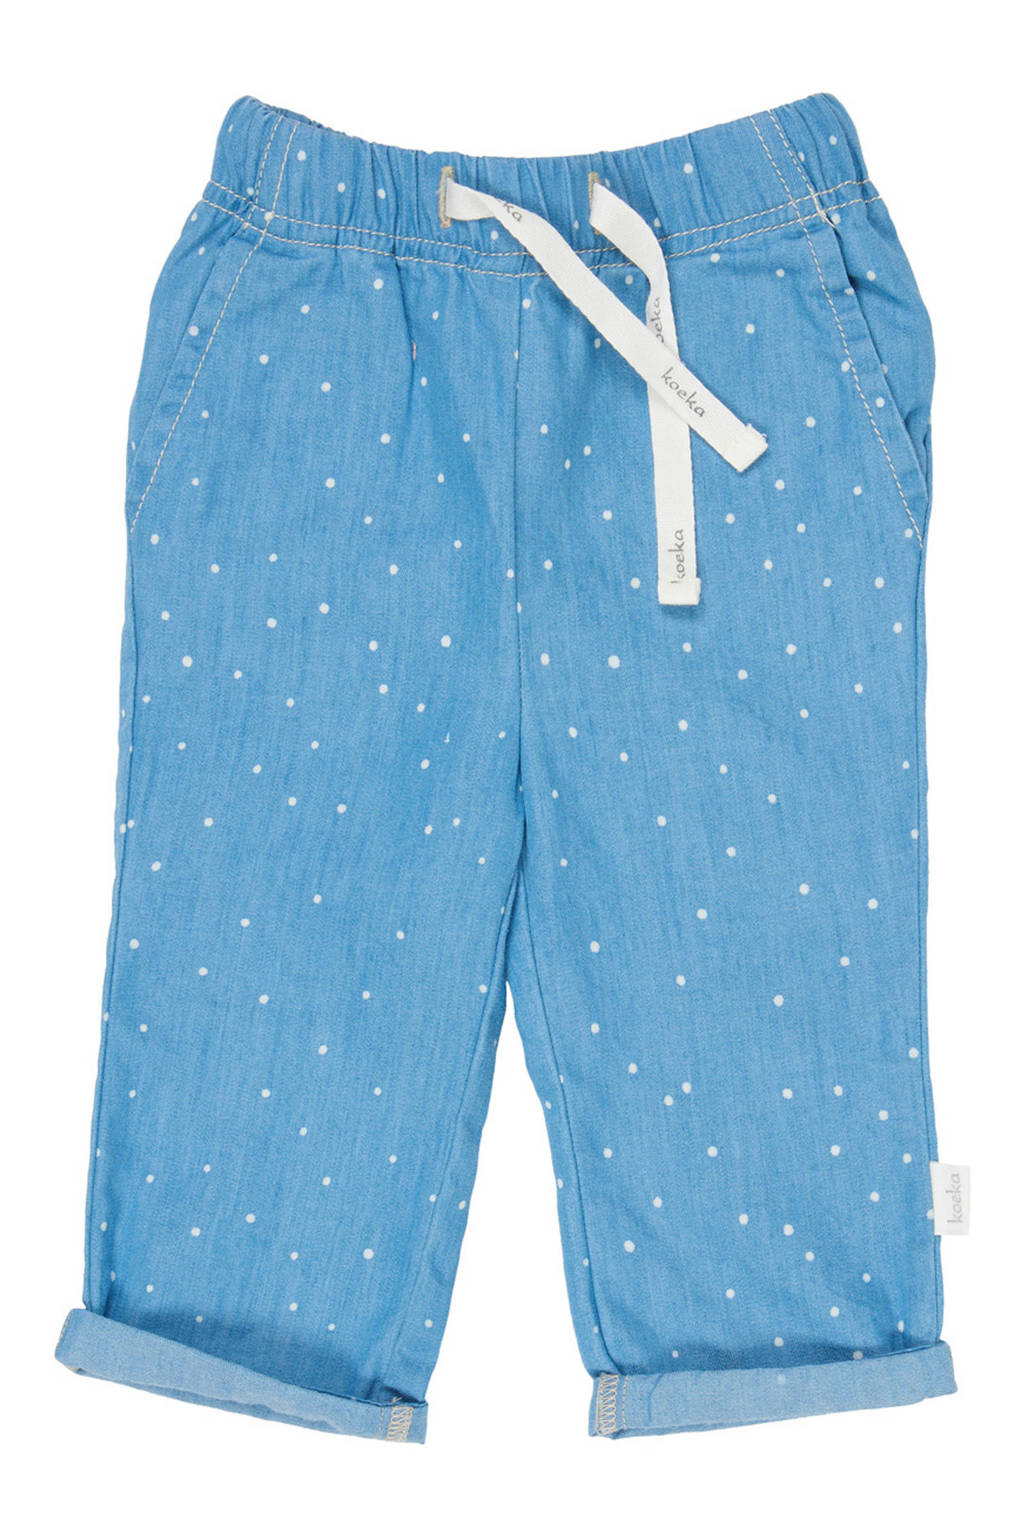 Koeka baby loose fit jeans Dotty Days met stippen, Light denim